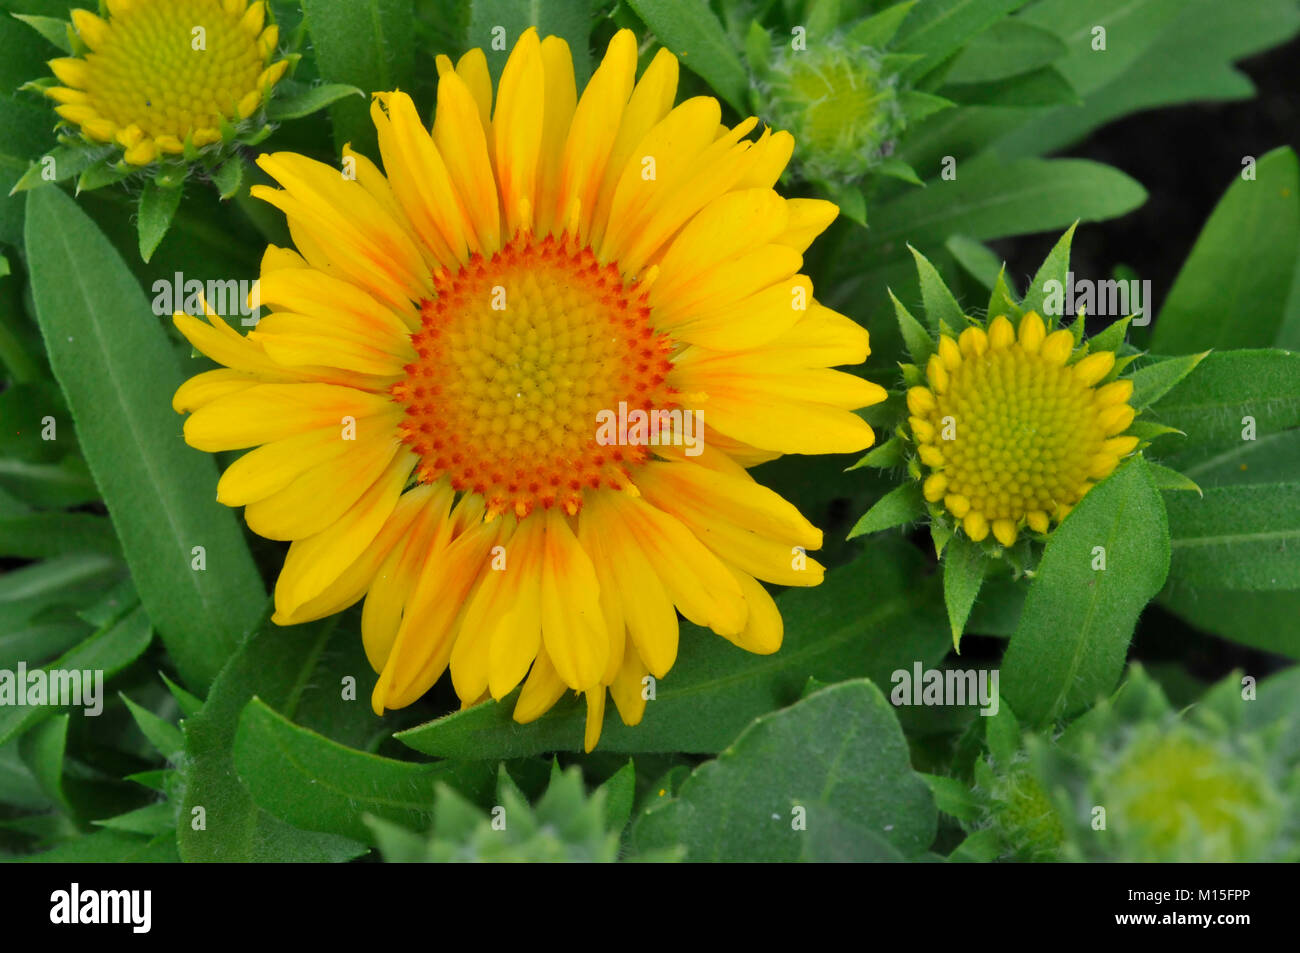 Three Yellow Blanket Flowers with Orange Center in Perennial Garden Stock Photo